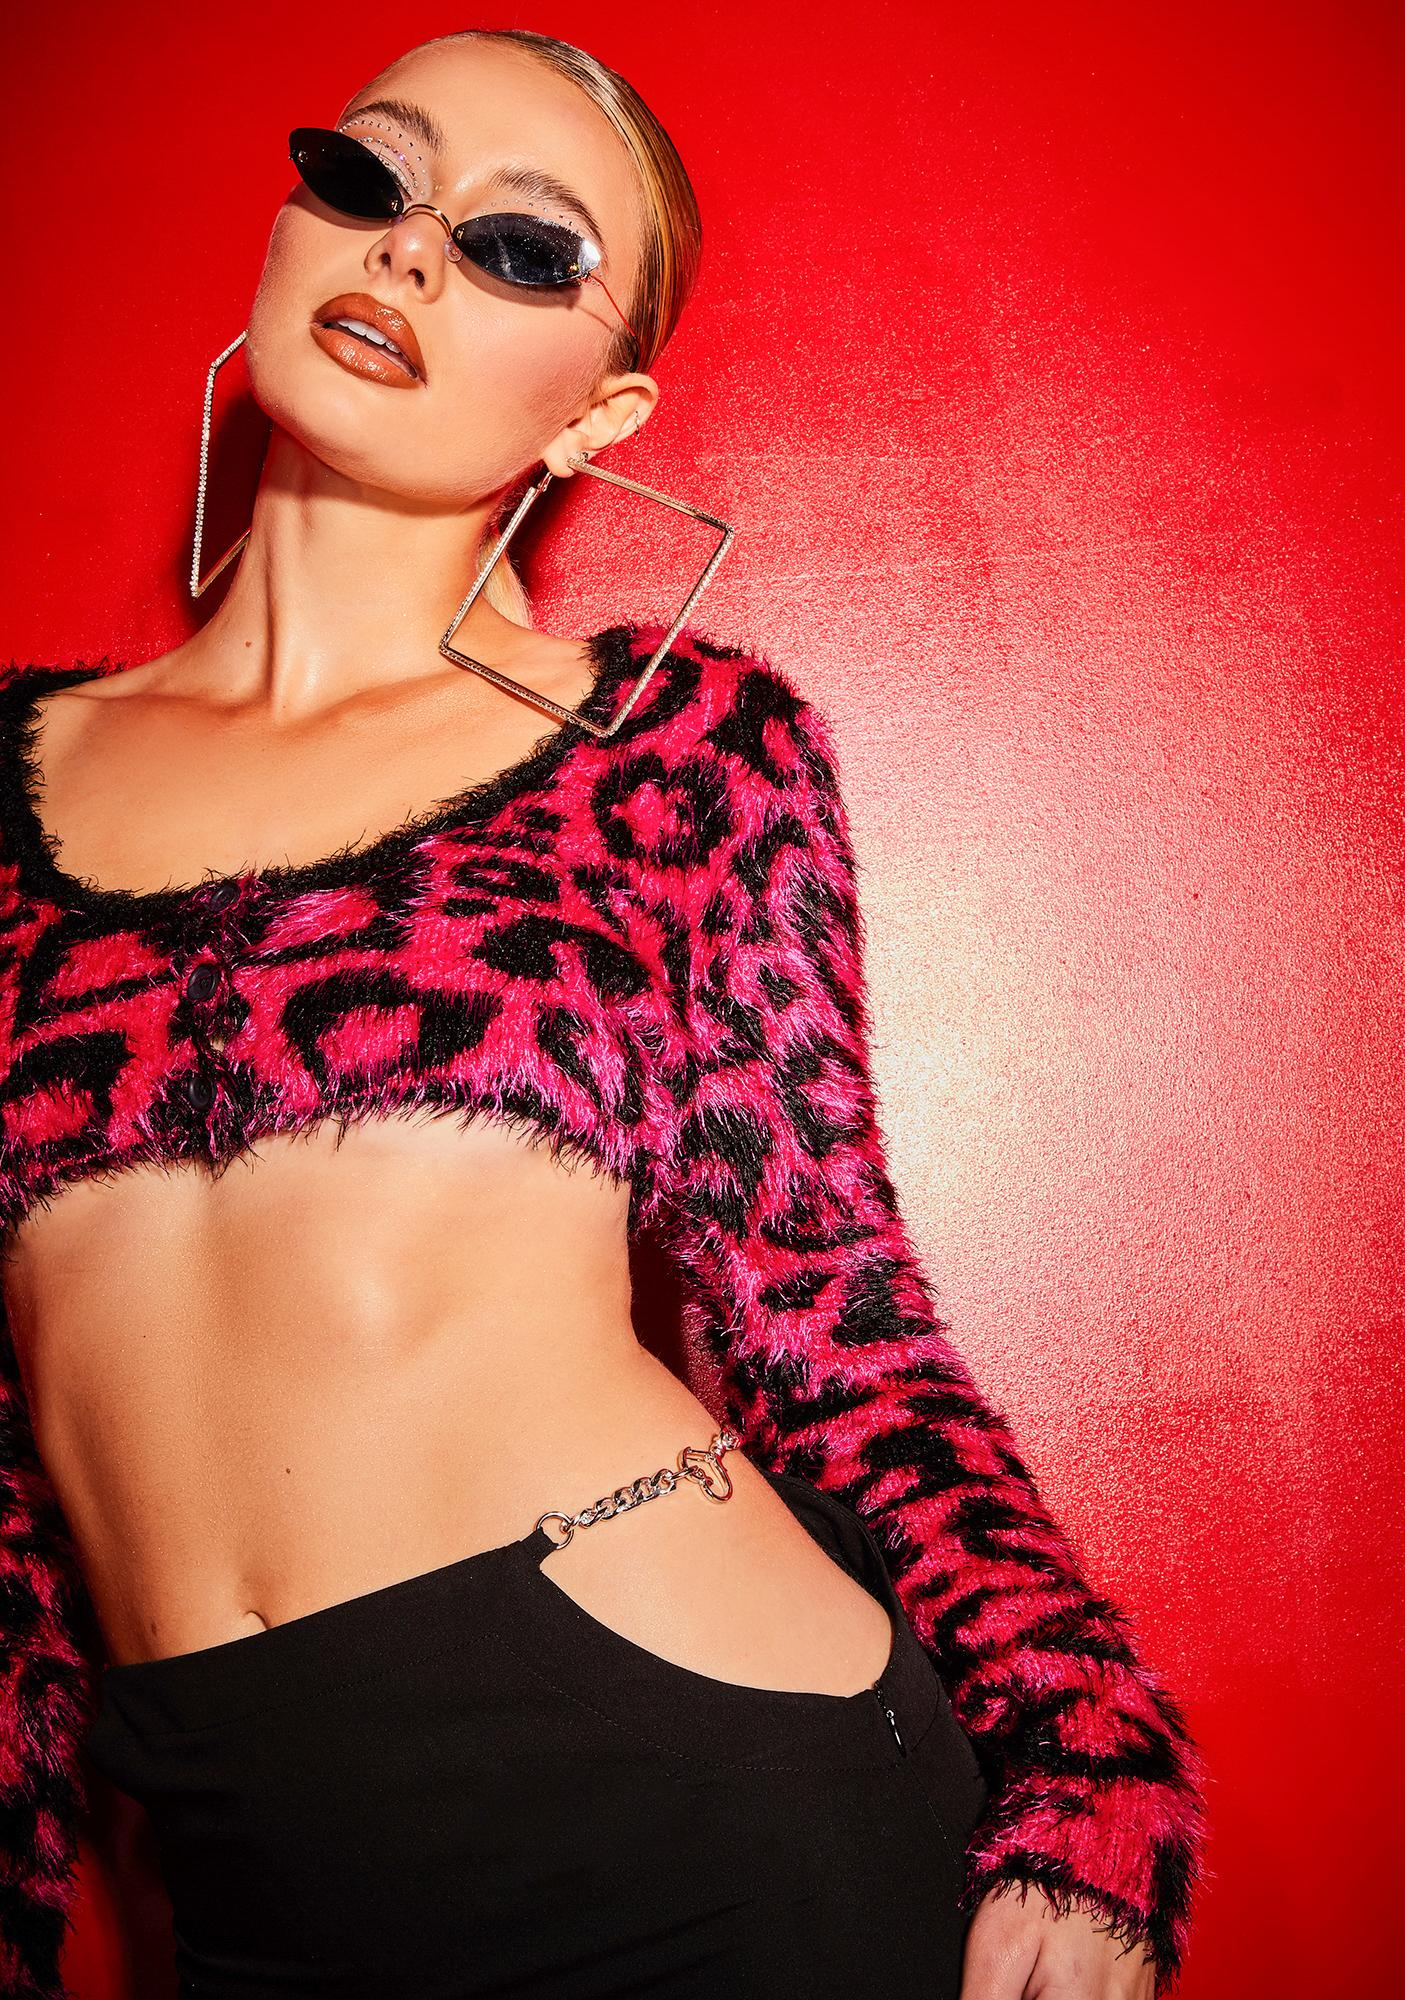 Poster Grl Picking Me Cheetah Heart Crop Cardigan